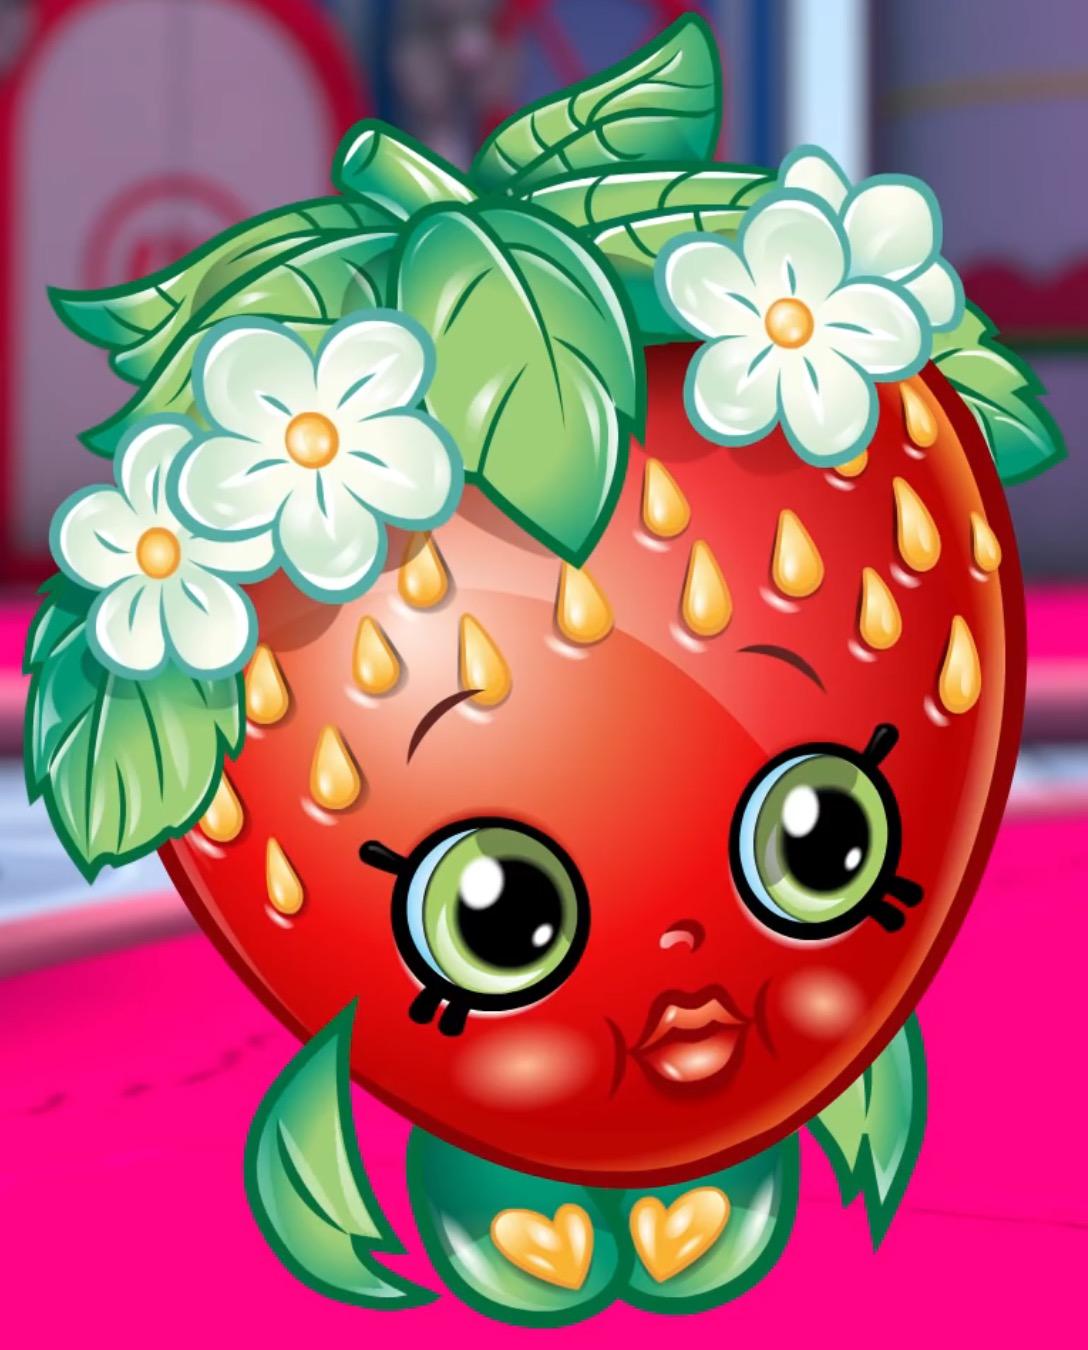 Strawberry Kiss Shopkins Cartoon Wiki FANDOM powered